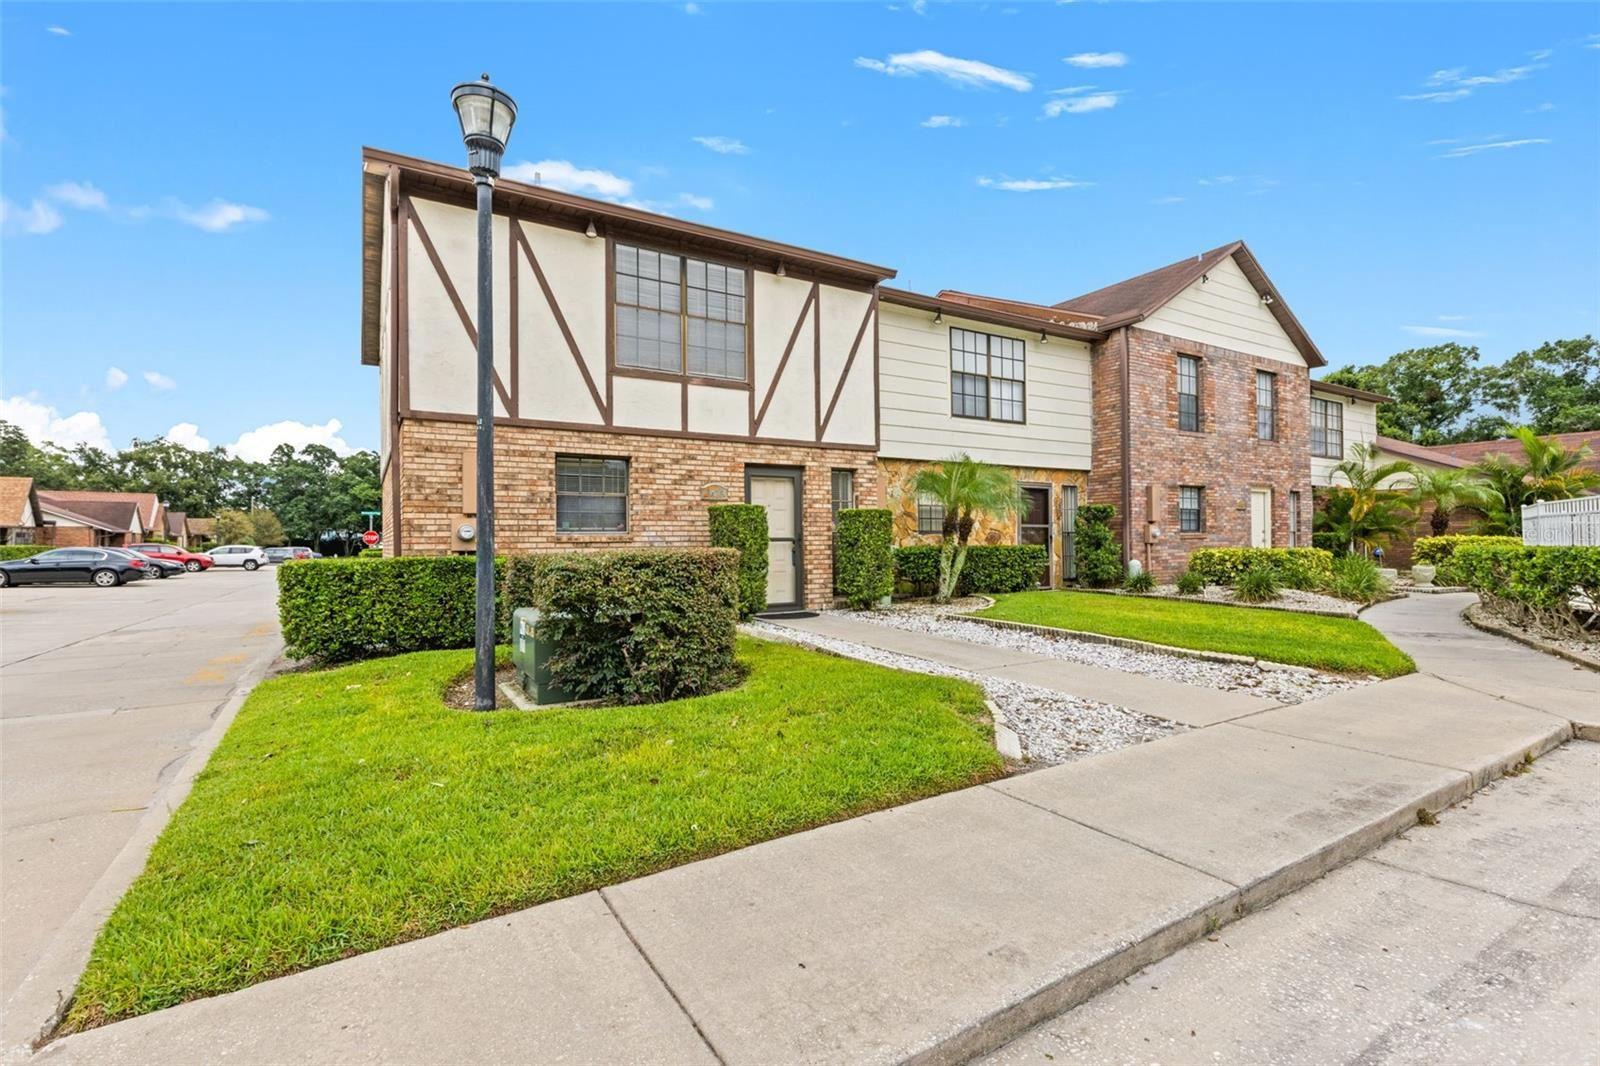 3428 SUNRISE VILLAS COURT N, Tampa, FL 33614 - #: T3320801